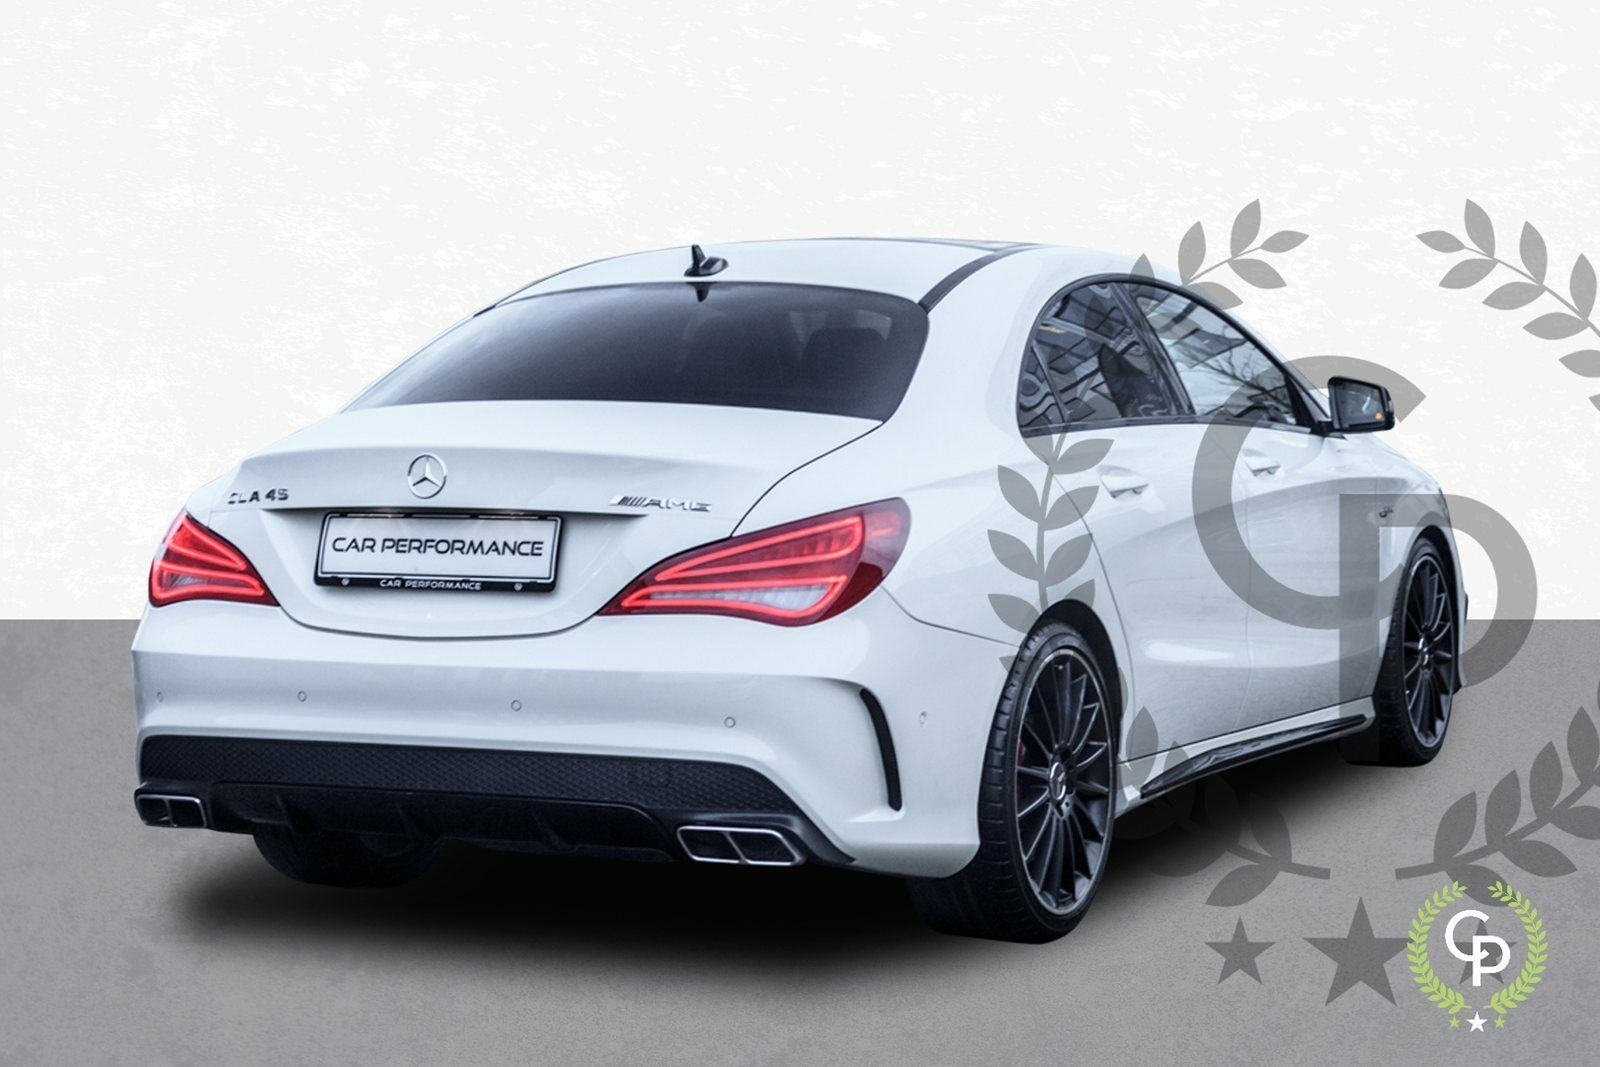 Mercedes CLA45